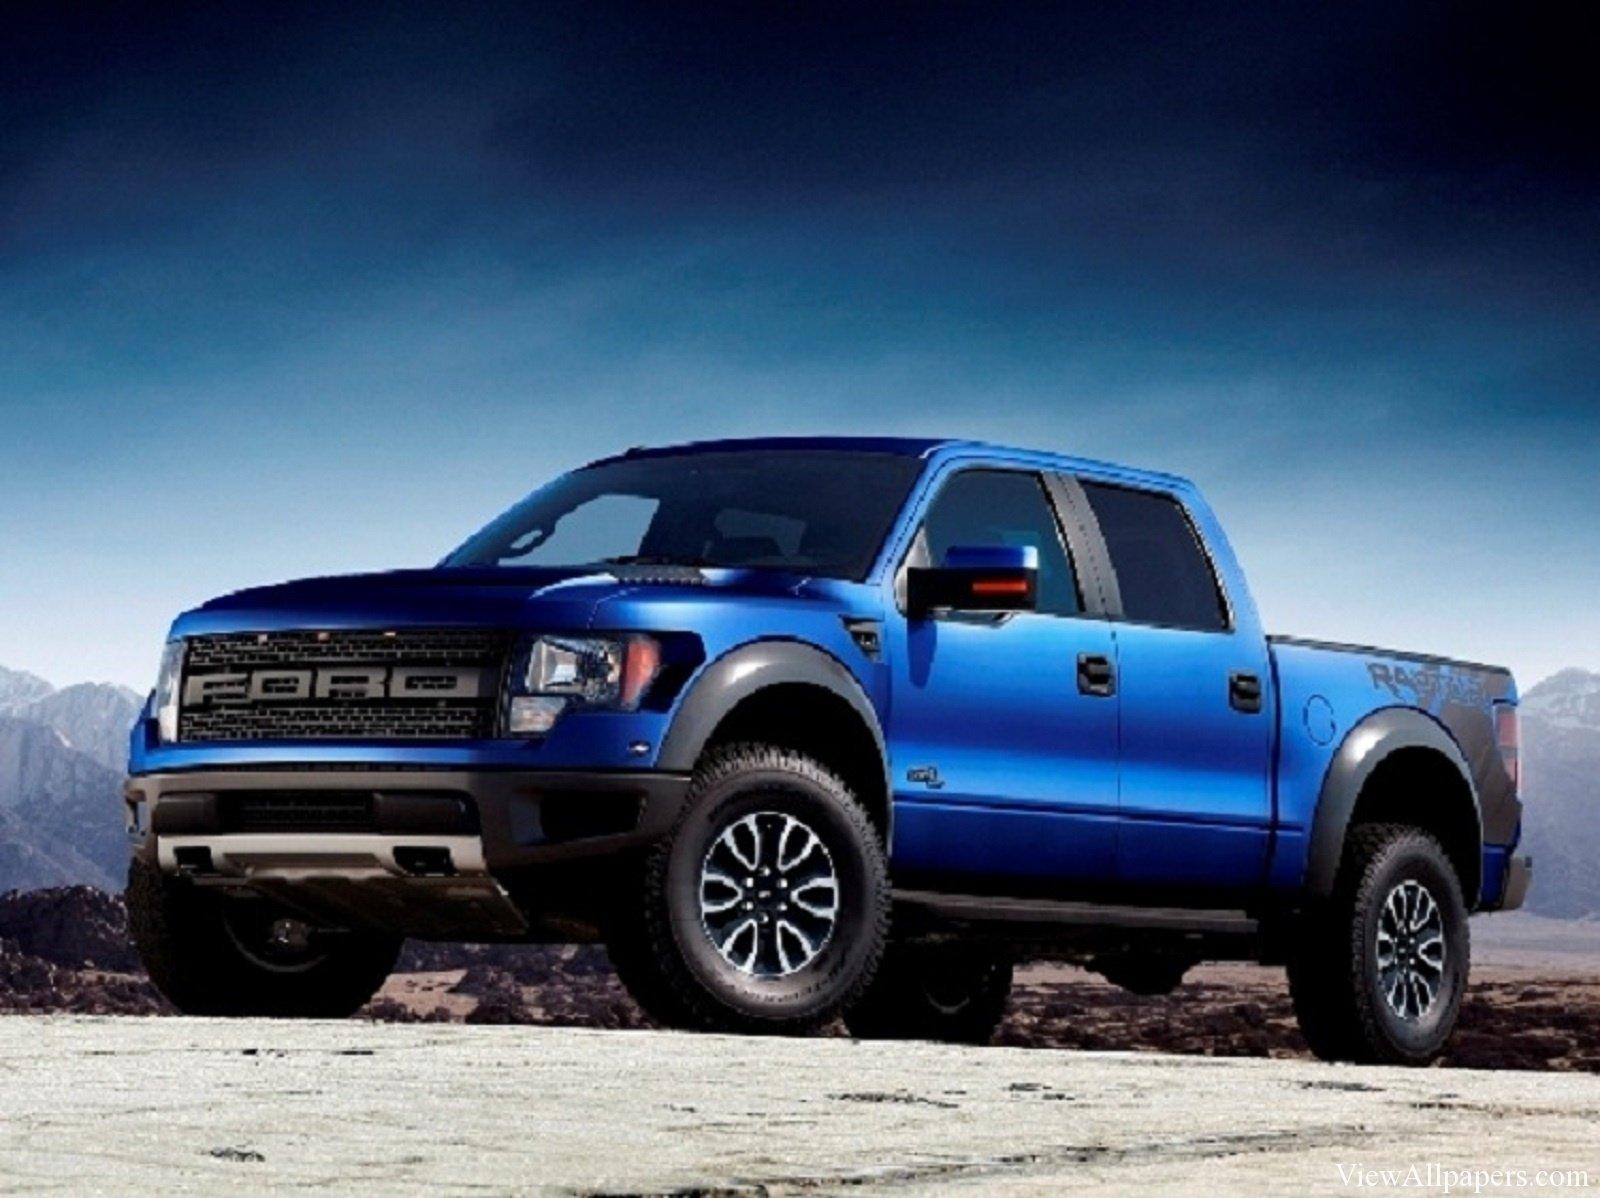 Ford Raptor Wallpaper Hd Oscargilaberte Com